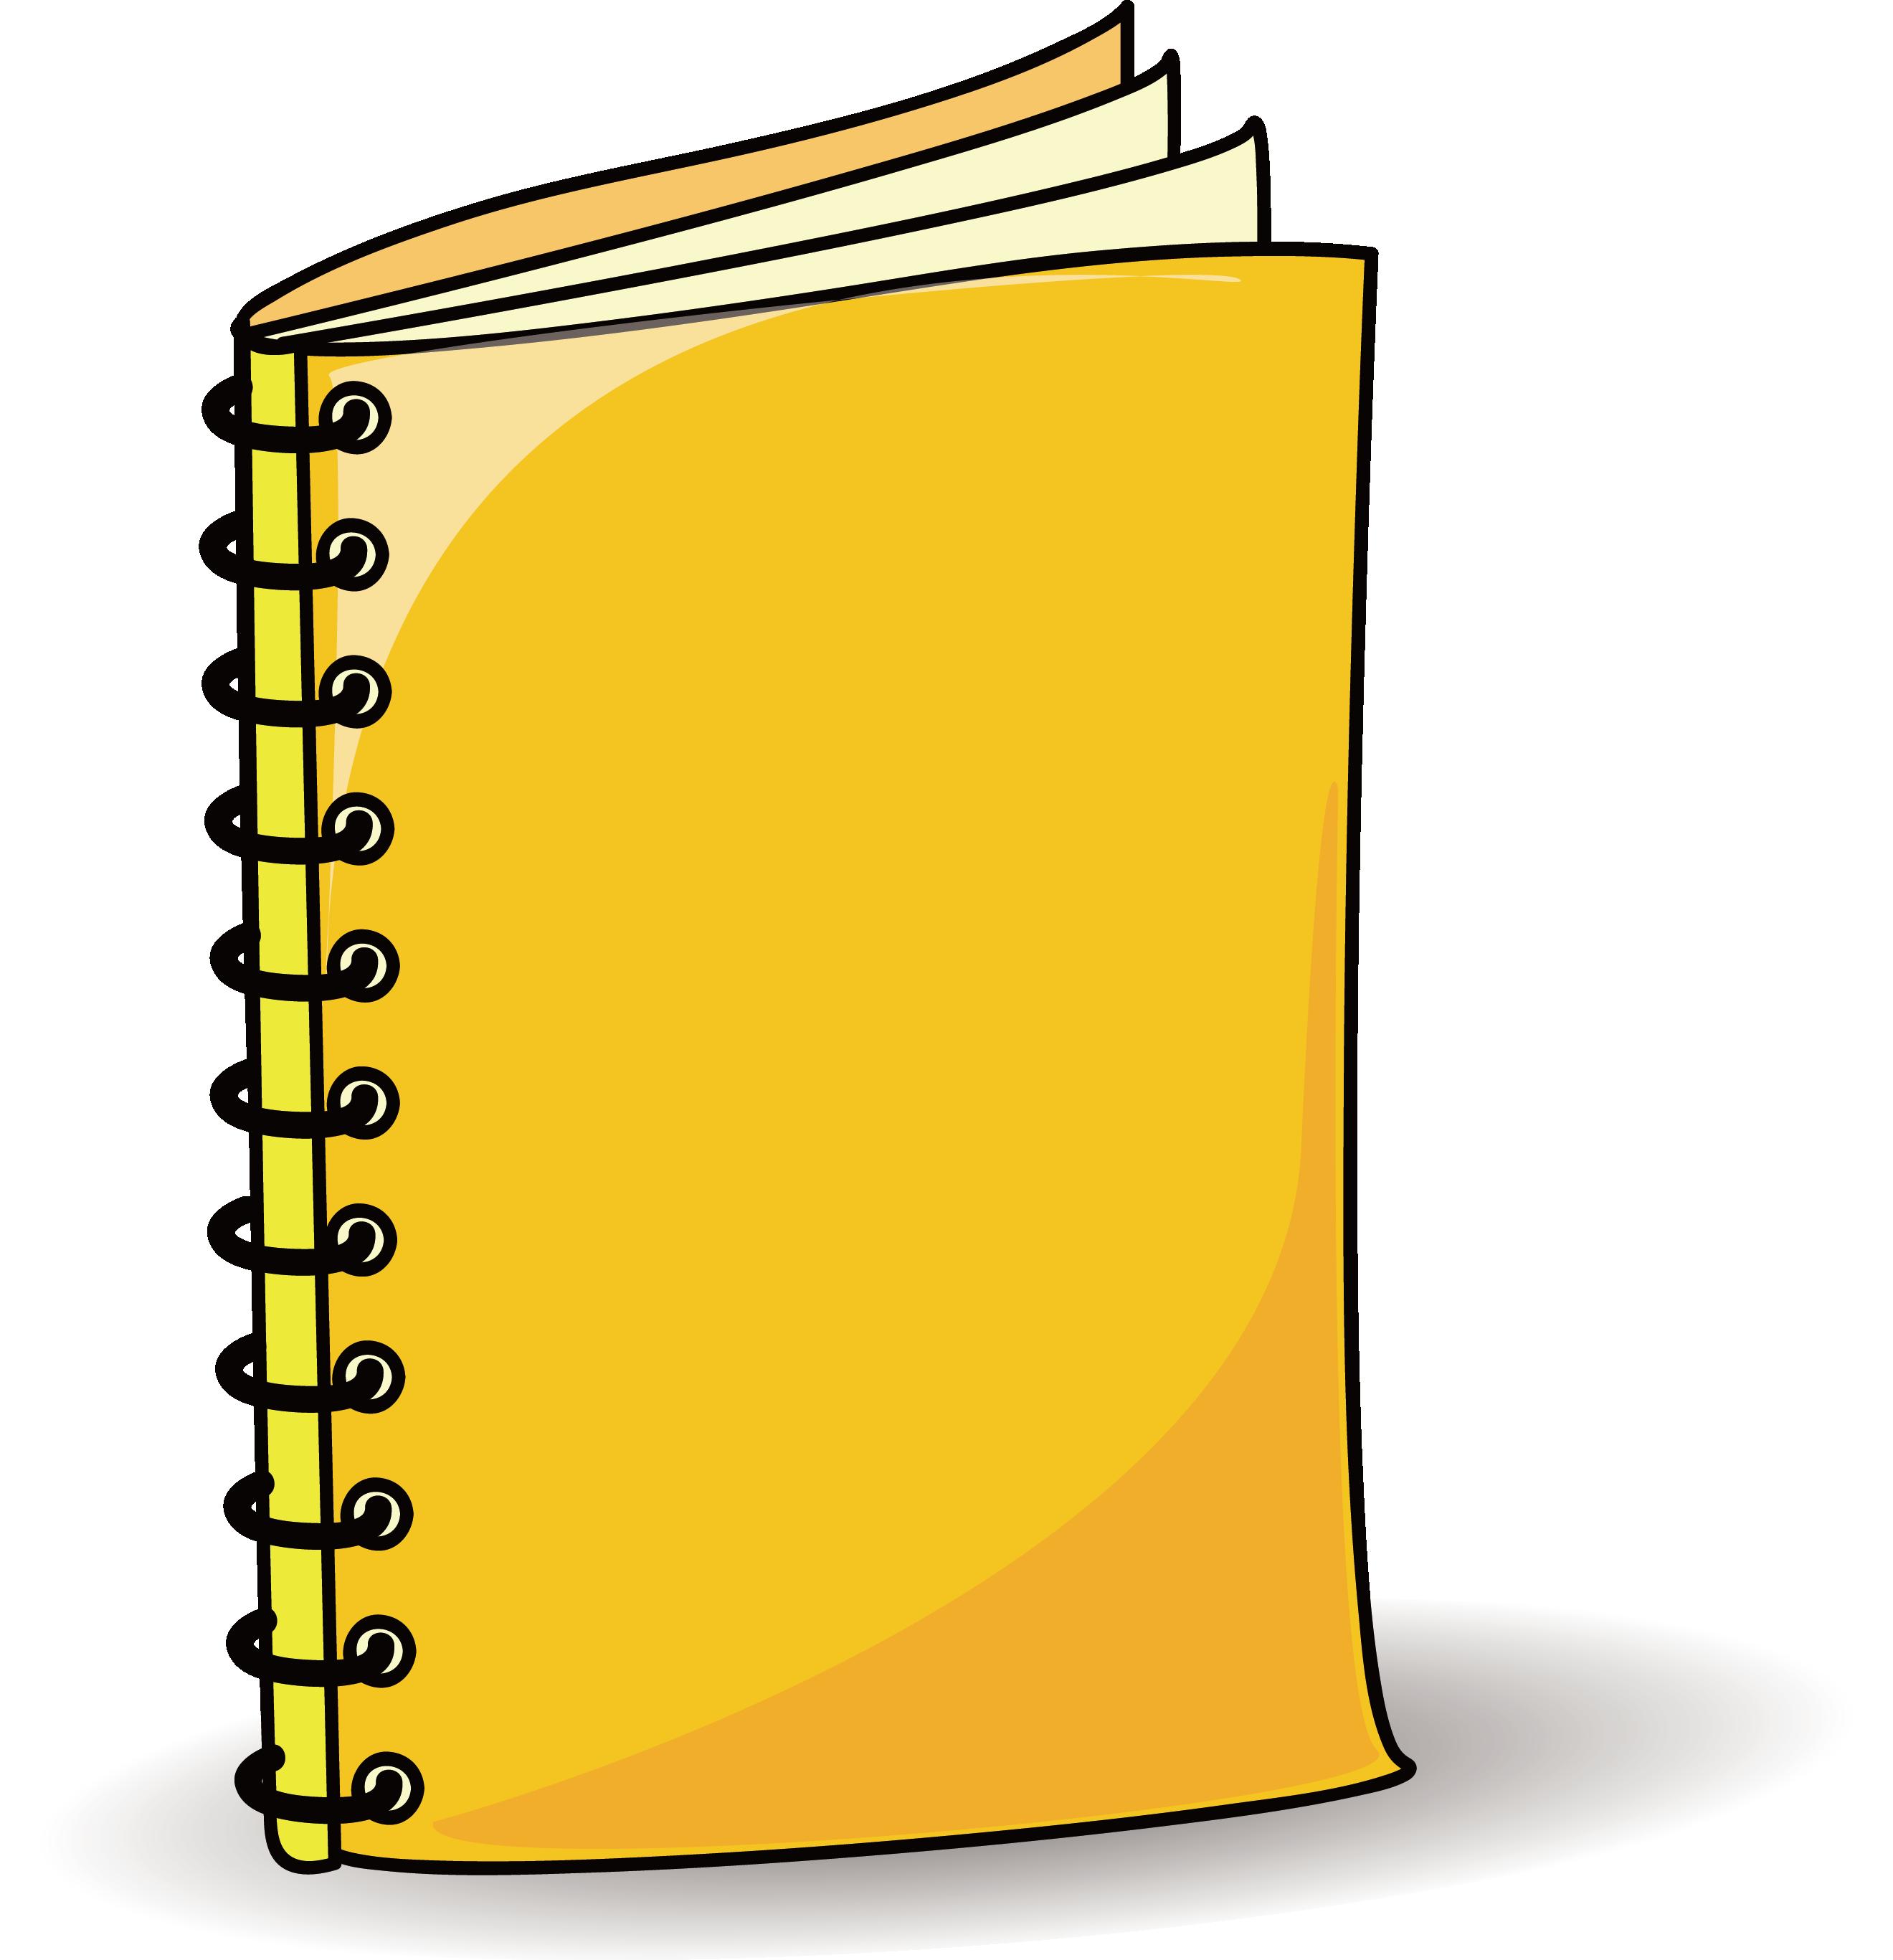 Notepad clipart cuaderno, Notepad cuaderno Transparent FREE for.